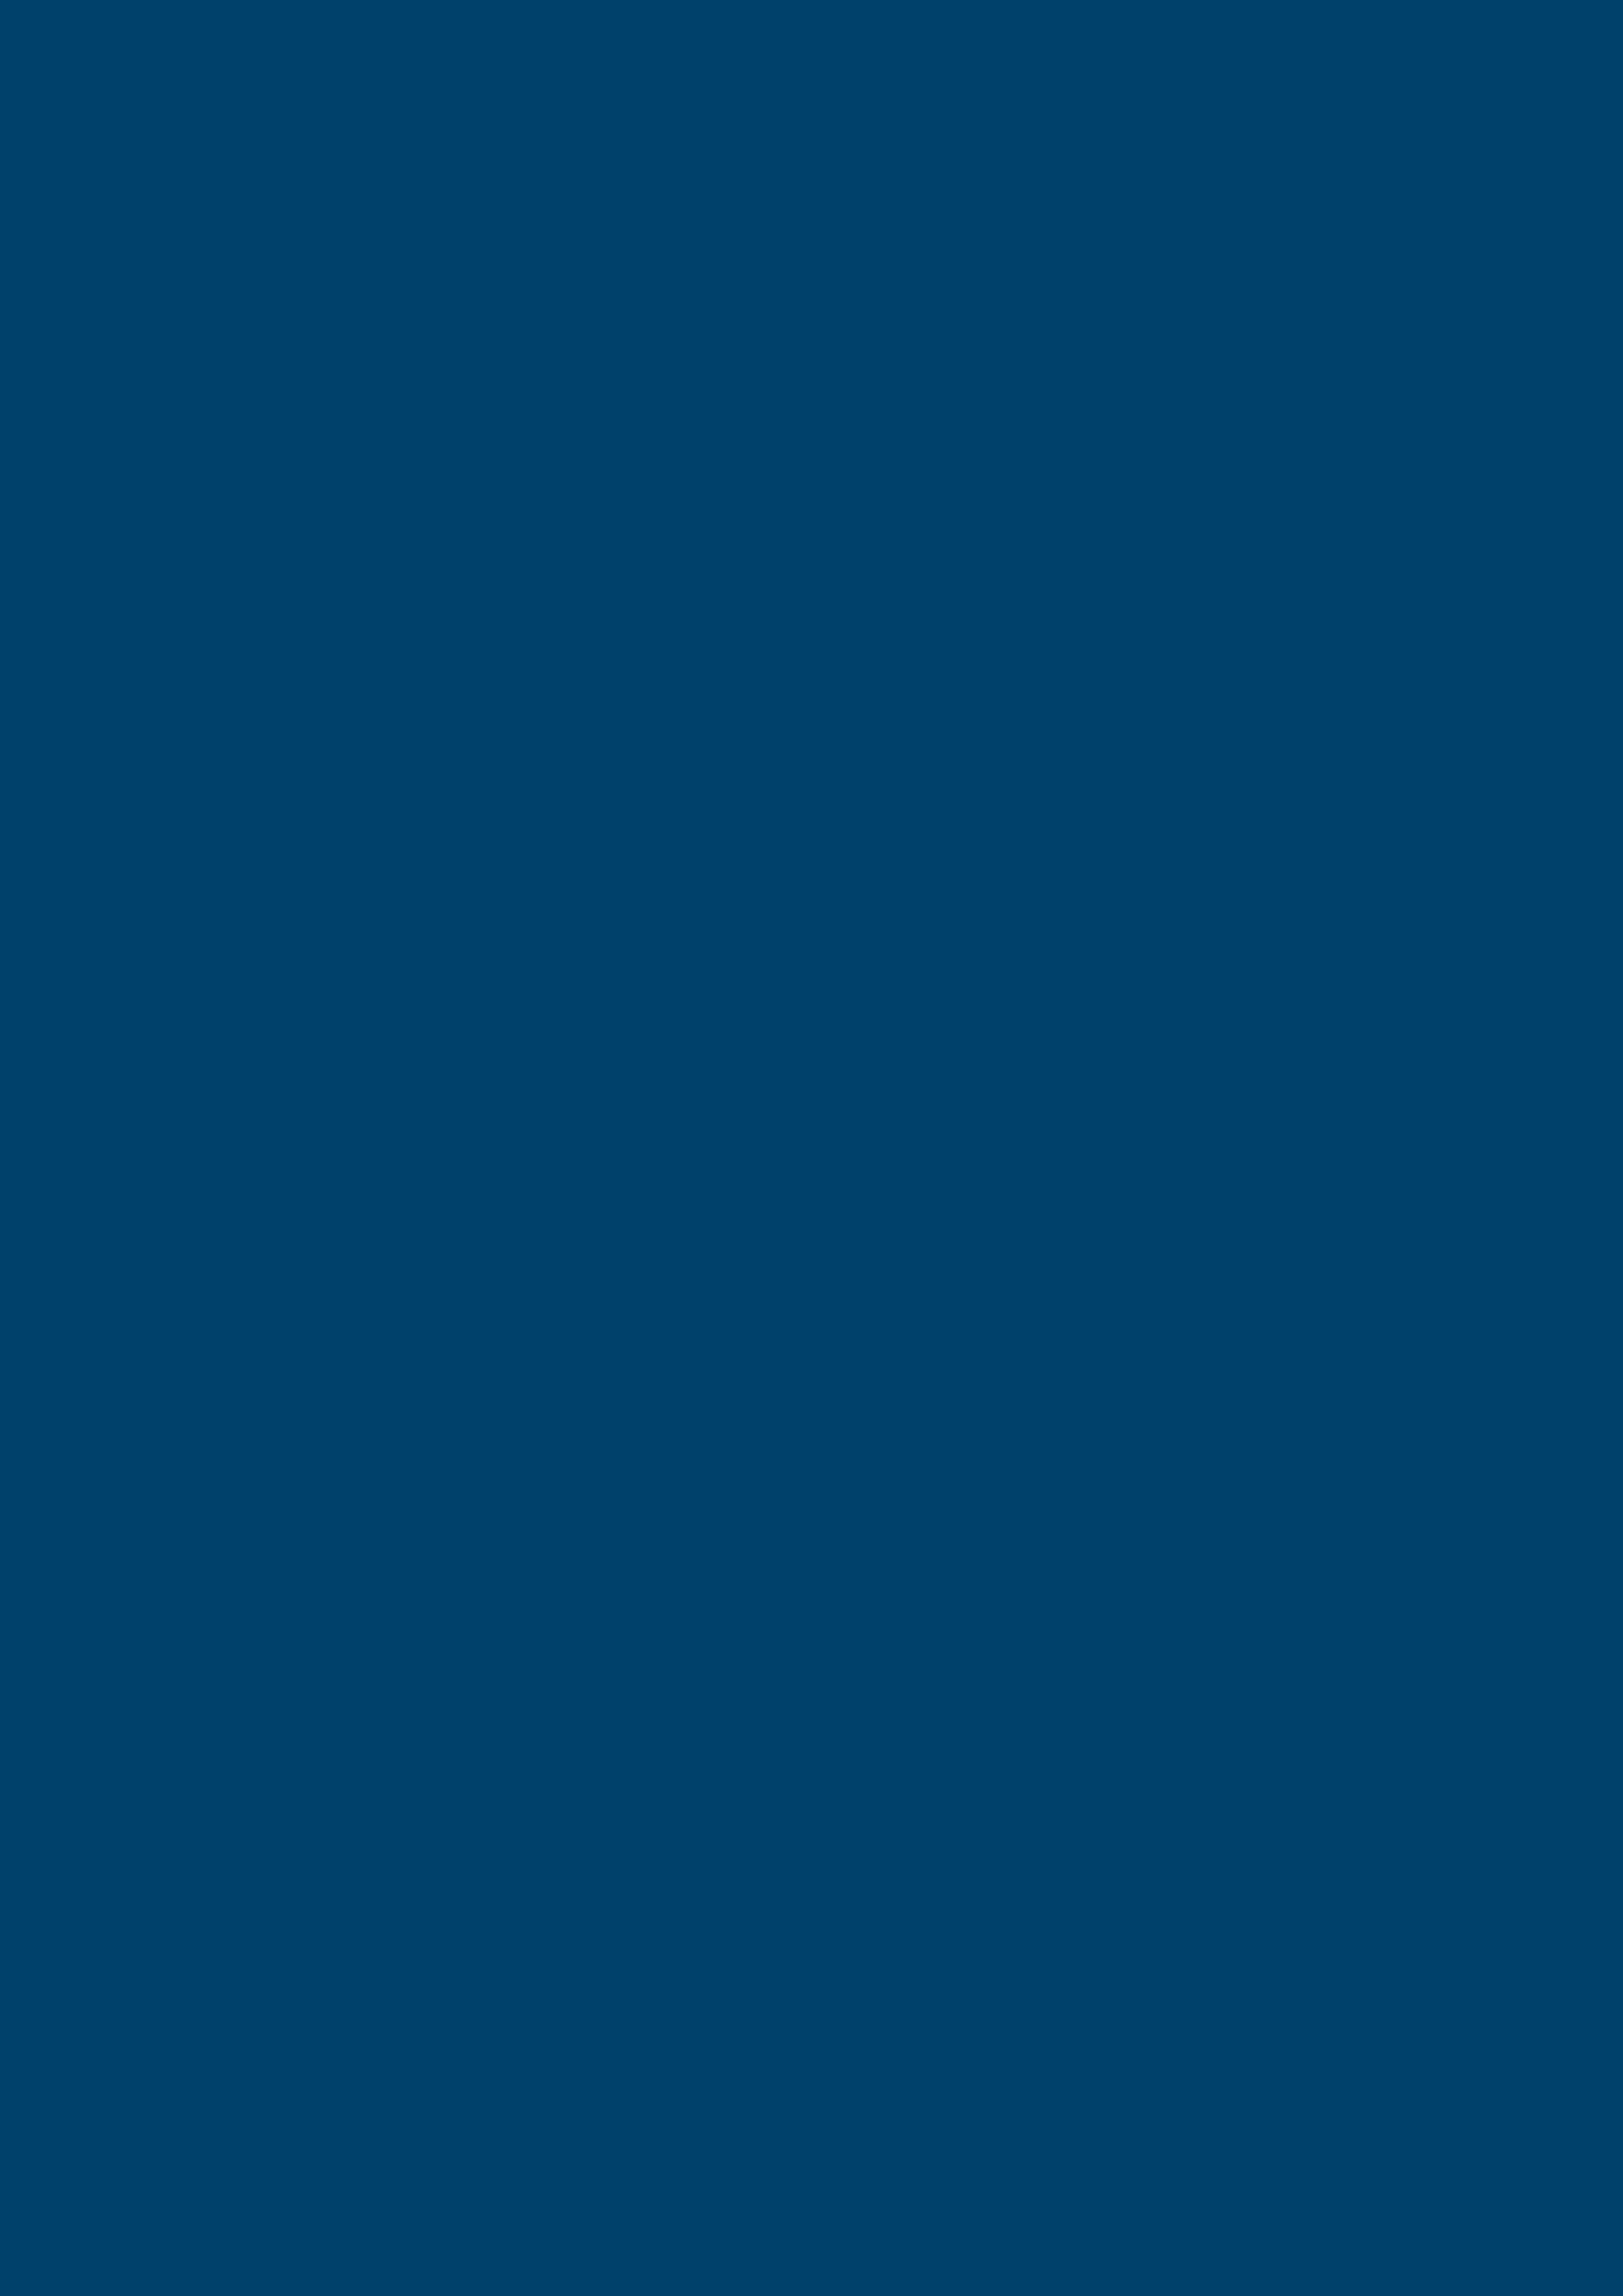 2480x3508 Indigo Dye Solid Color Background